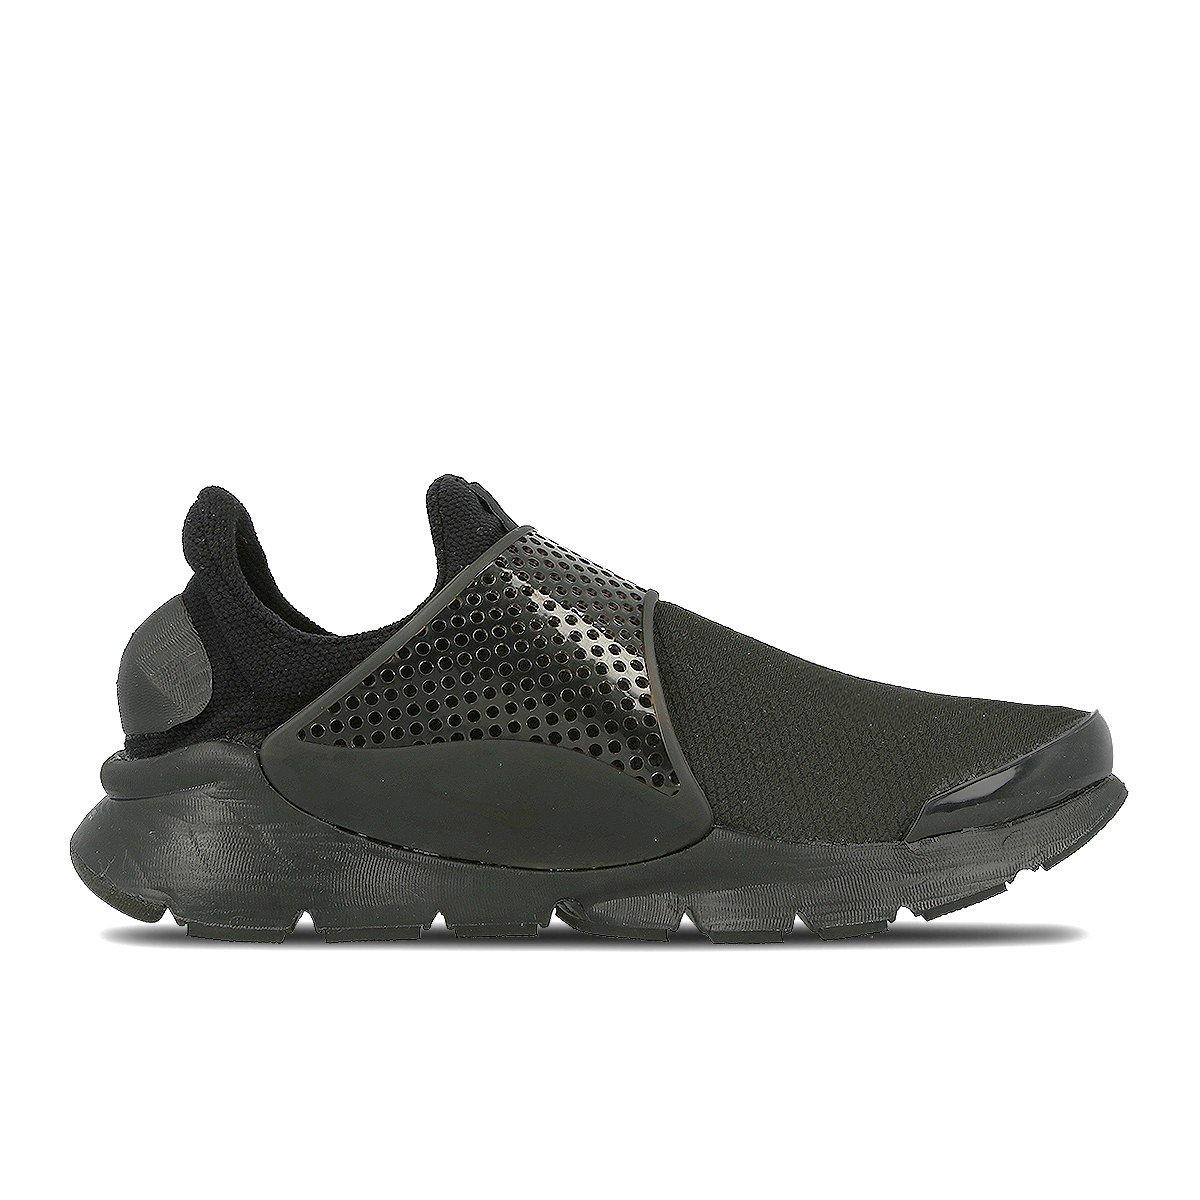 NIKE Womens Sock Dart Running Shoes B01JJD3PVO 8 B(M) US Black/Black-volt